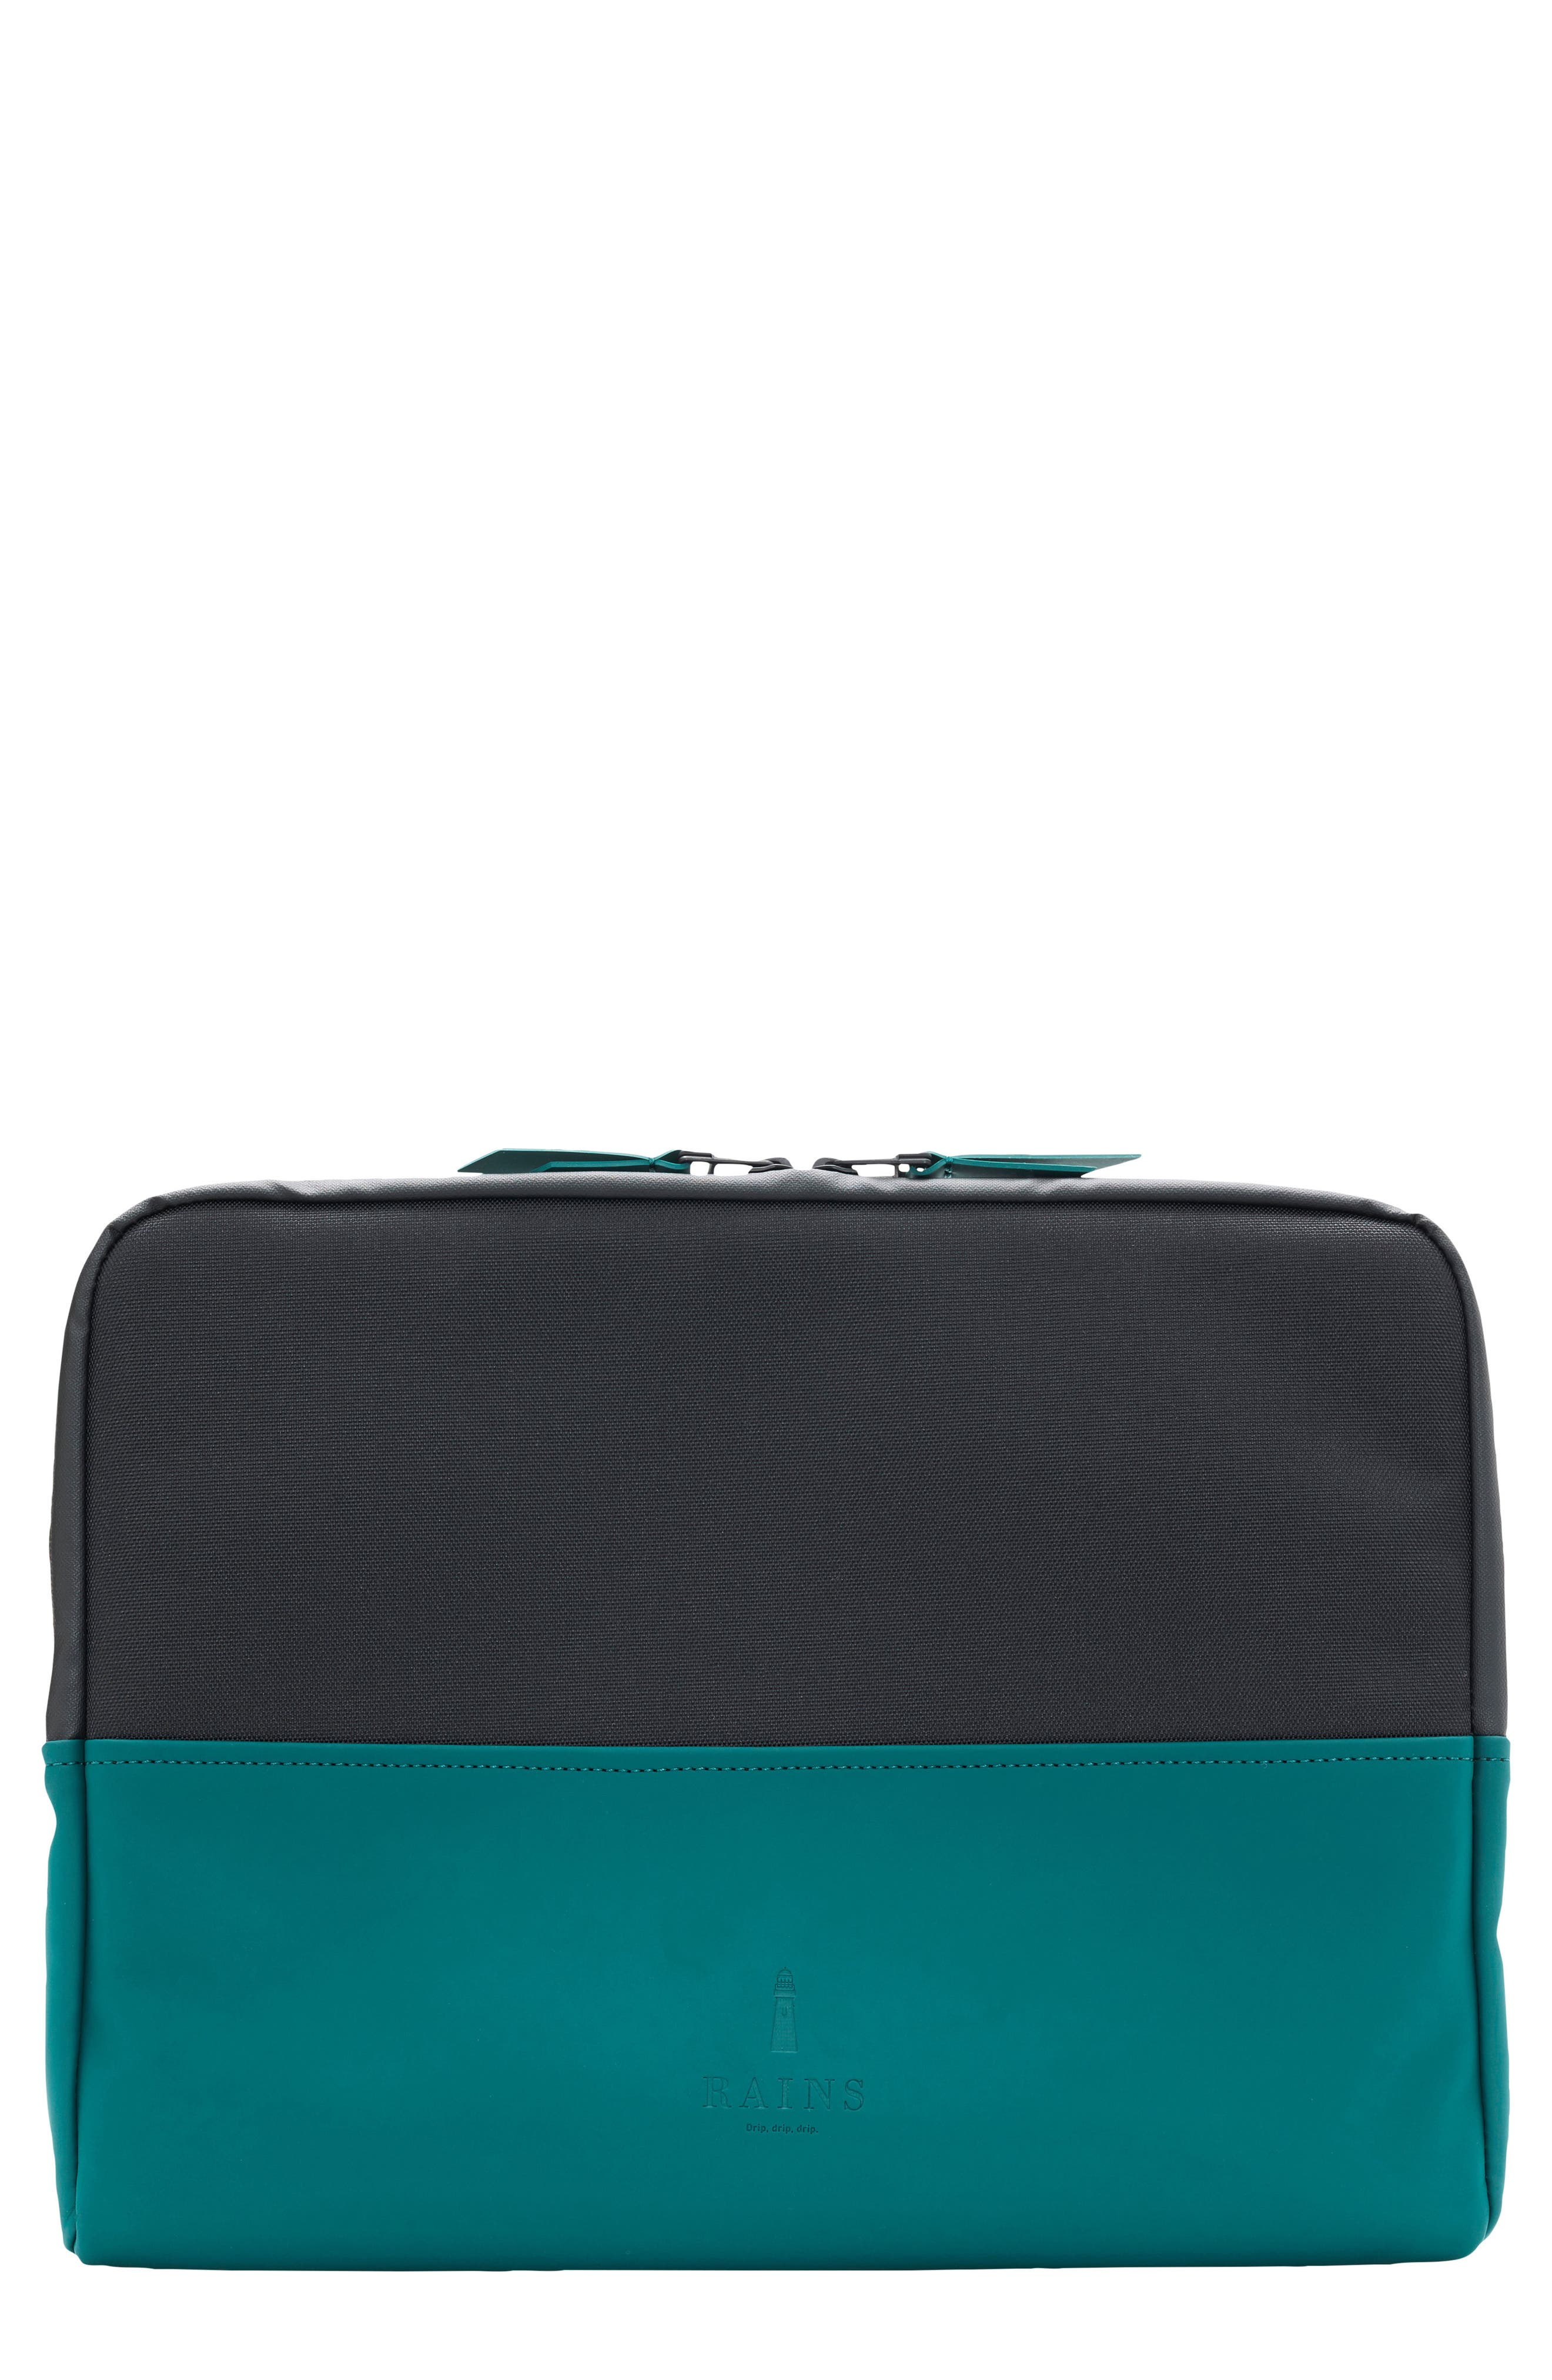 RAINS 13-Inch Laptop Sleeve